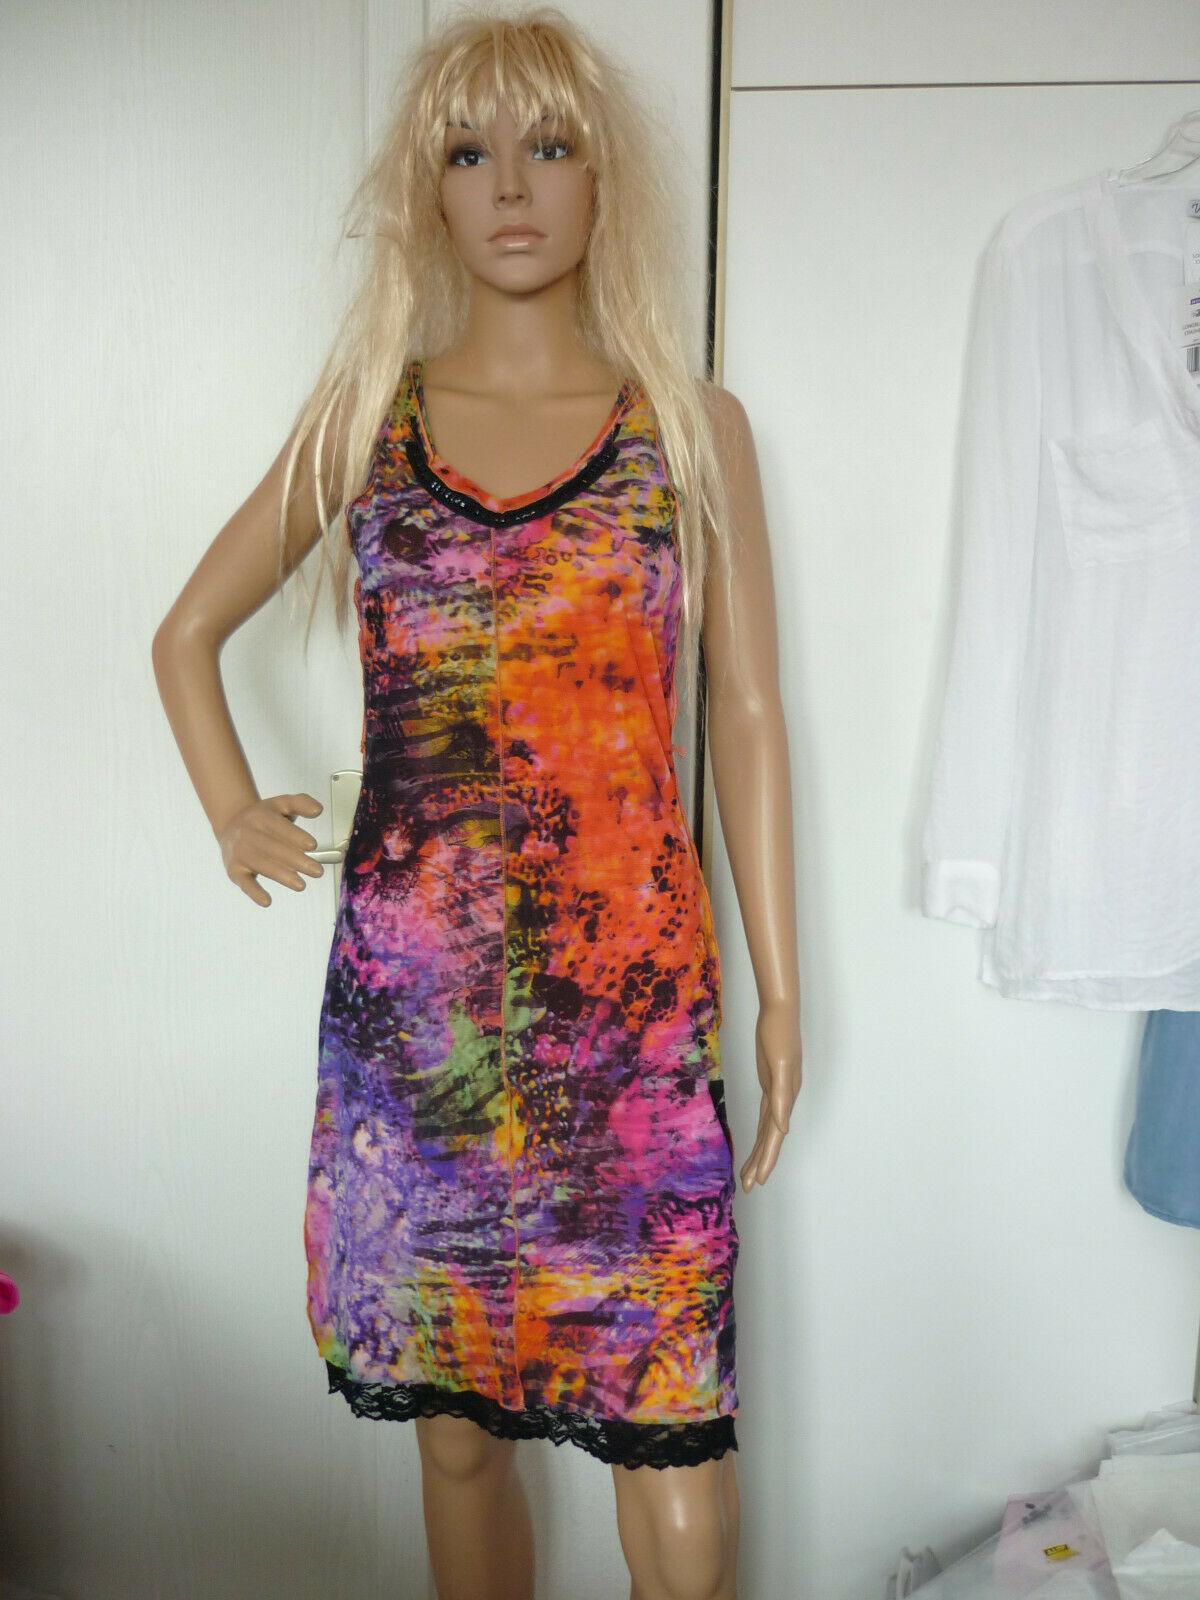 20 Leicht Sommerkleid Etuikleid ÄrmelFormal Einfach Sommerkleid Etuikleid Spezialgebiet